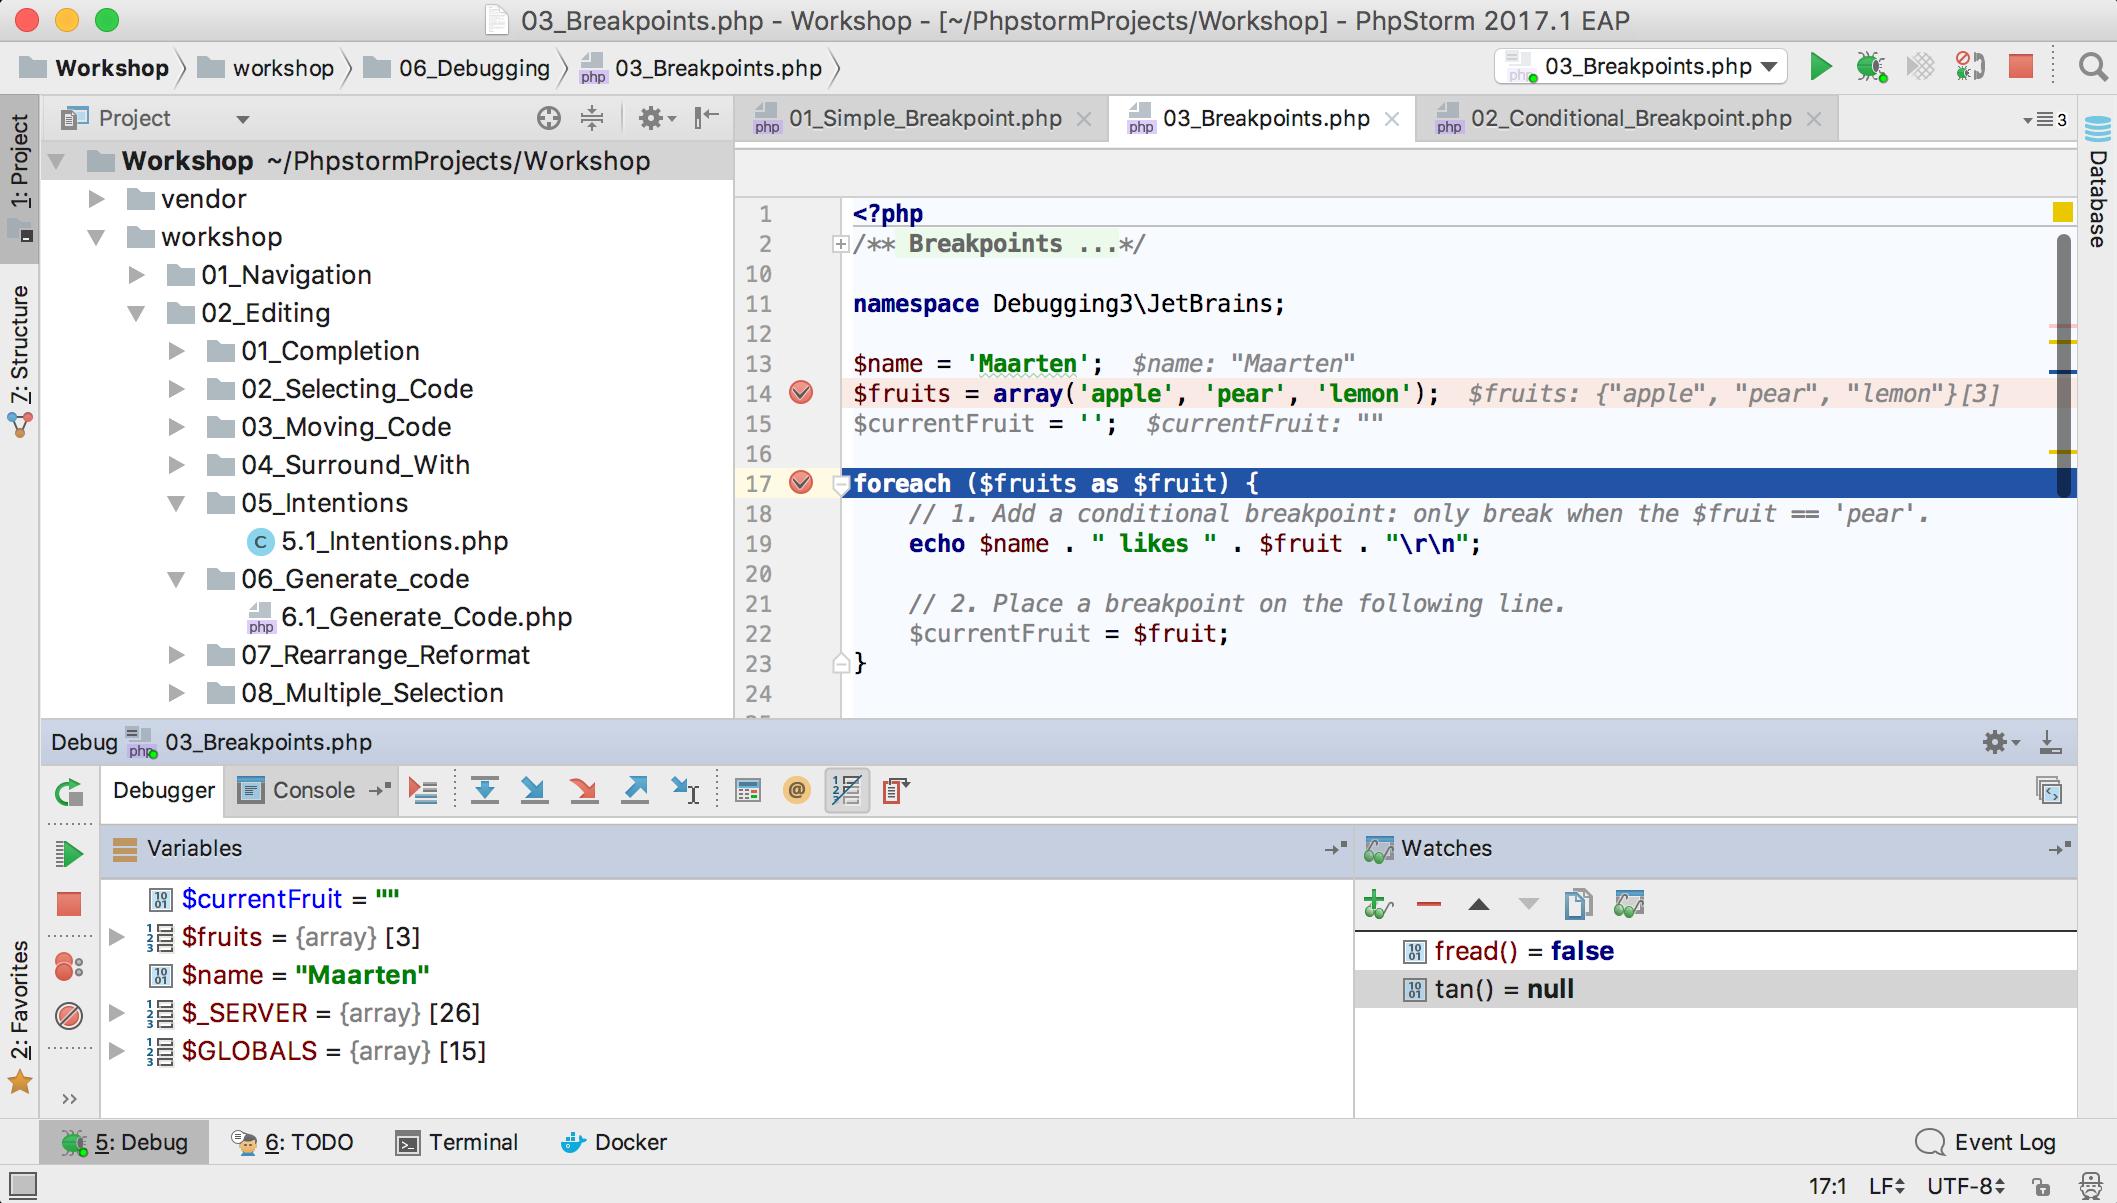 ps_quick_start_user_interface_mac.png